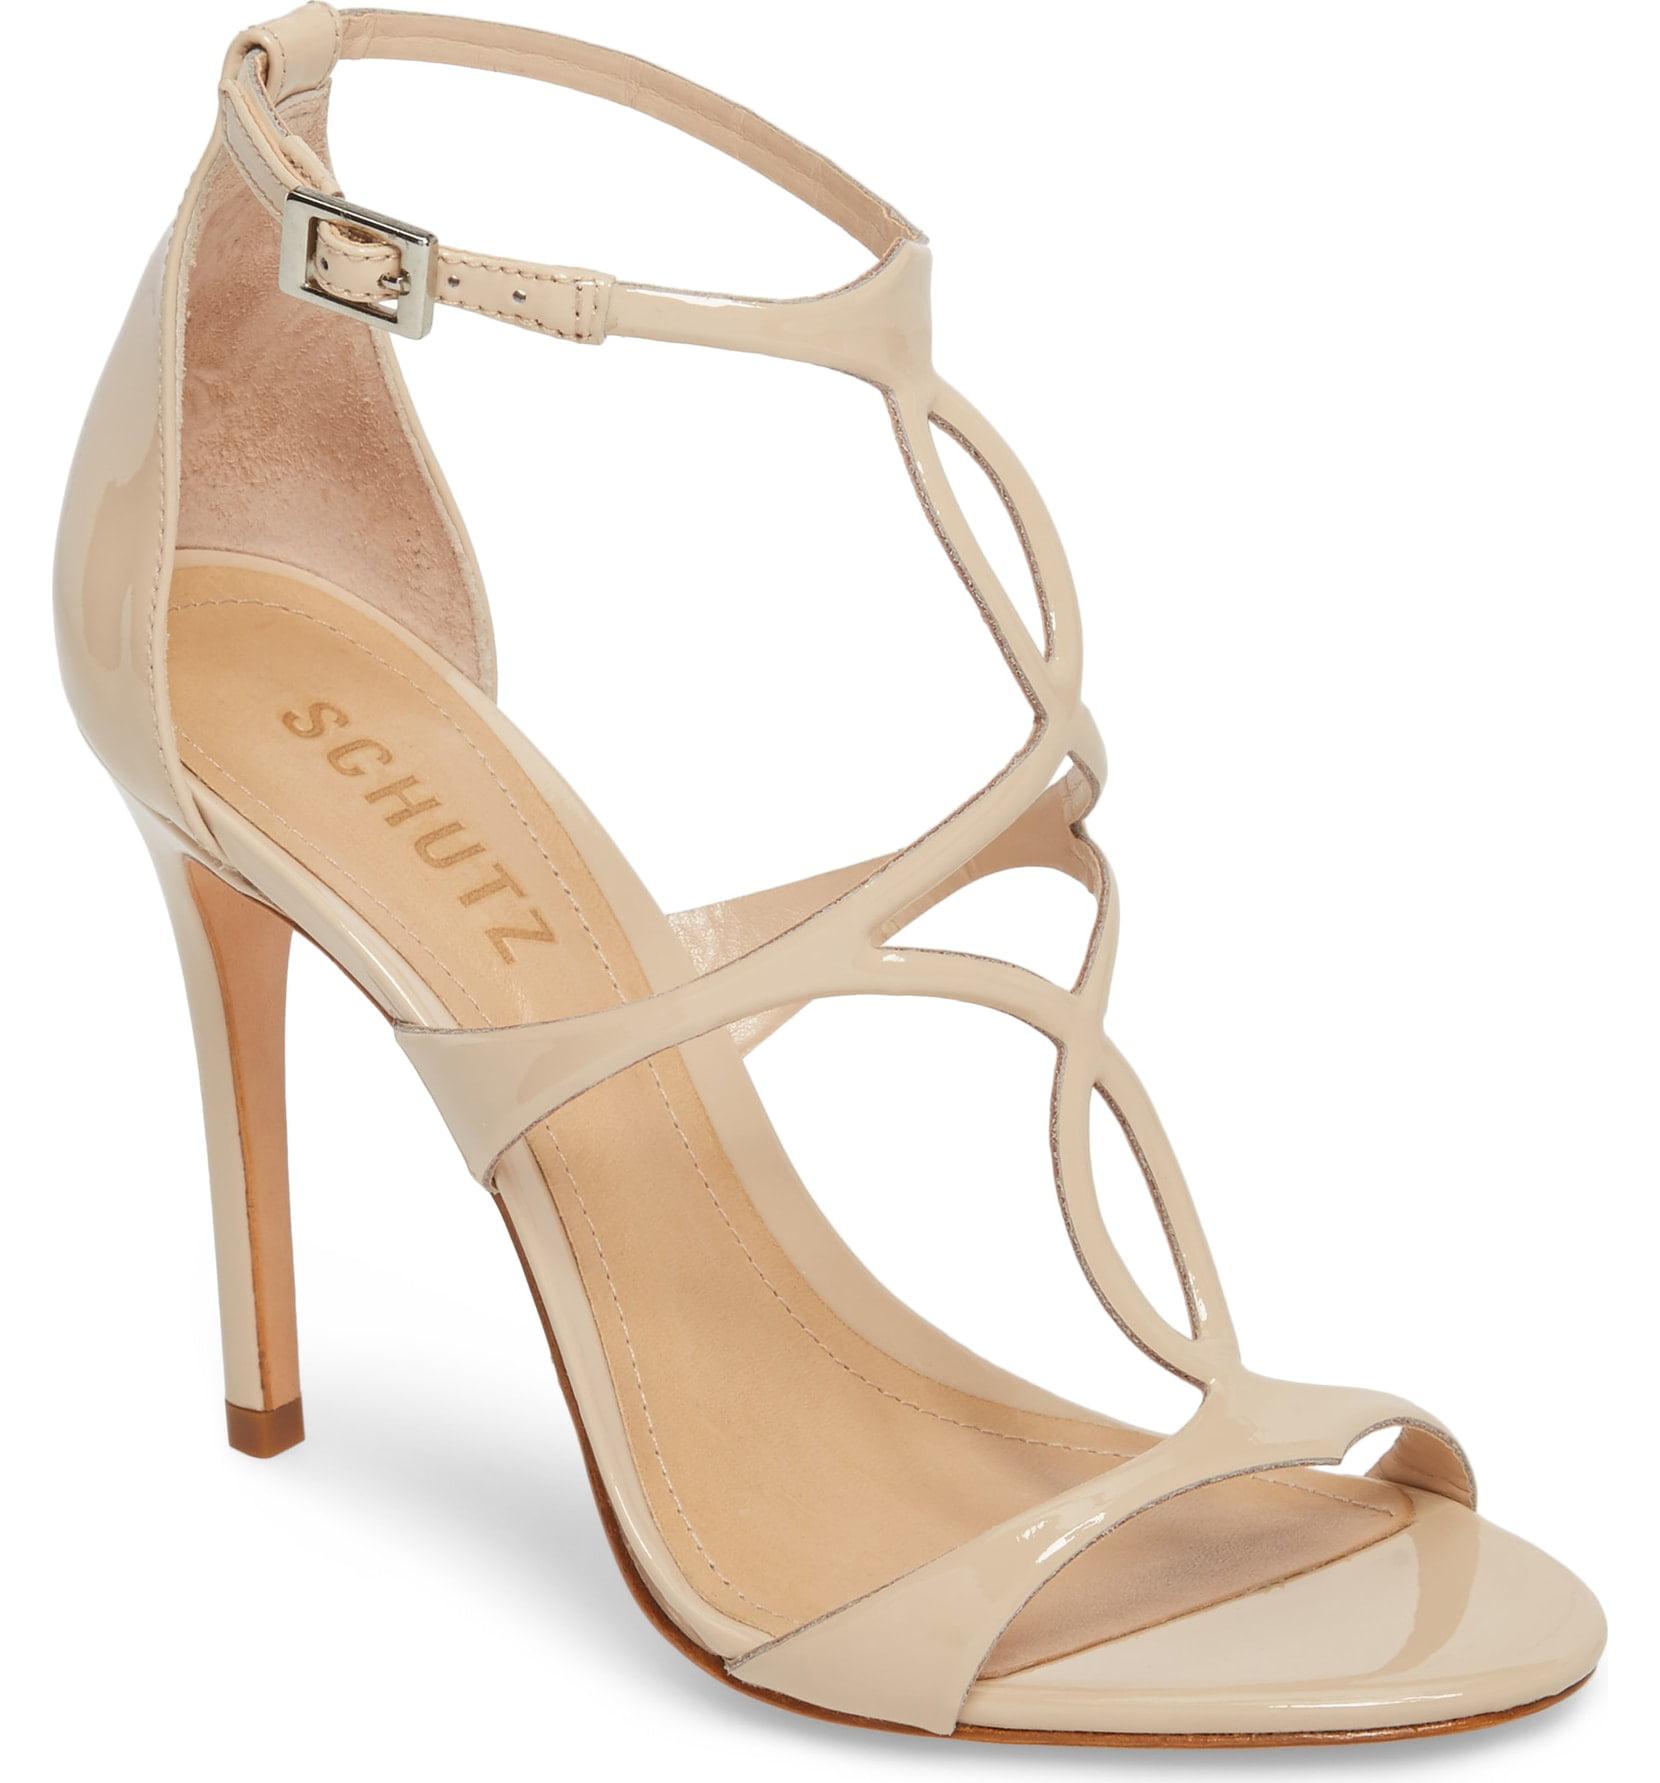 SCHUTZ Women/'s Emily Bright Red Block Heel Woven Suede Tassel Mule Pump Sandals